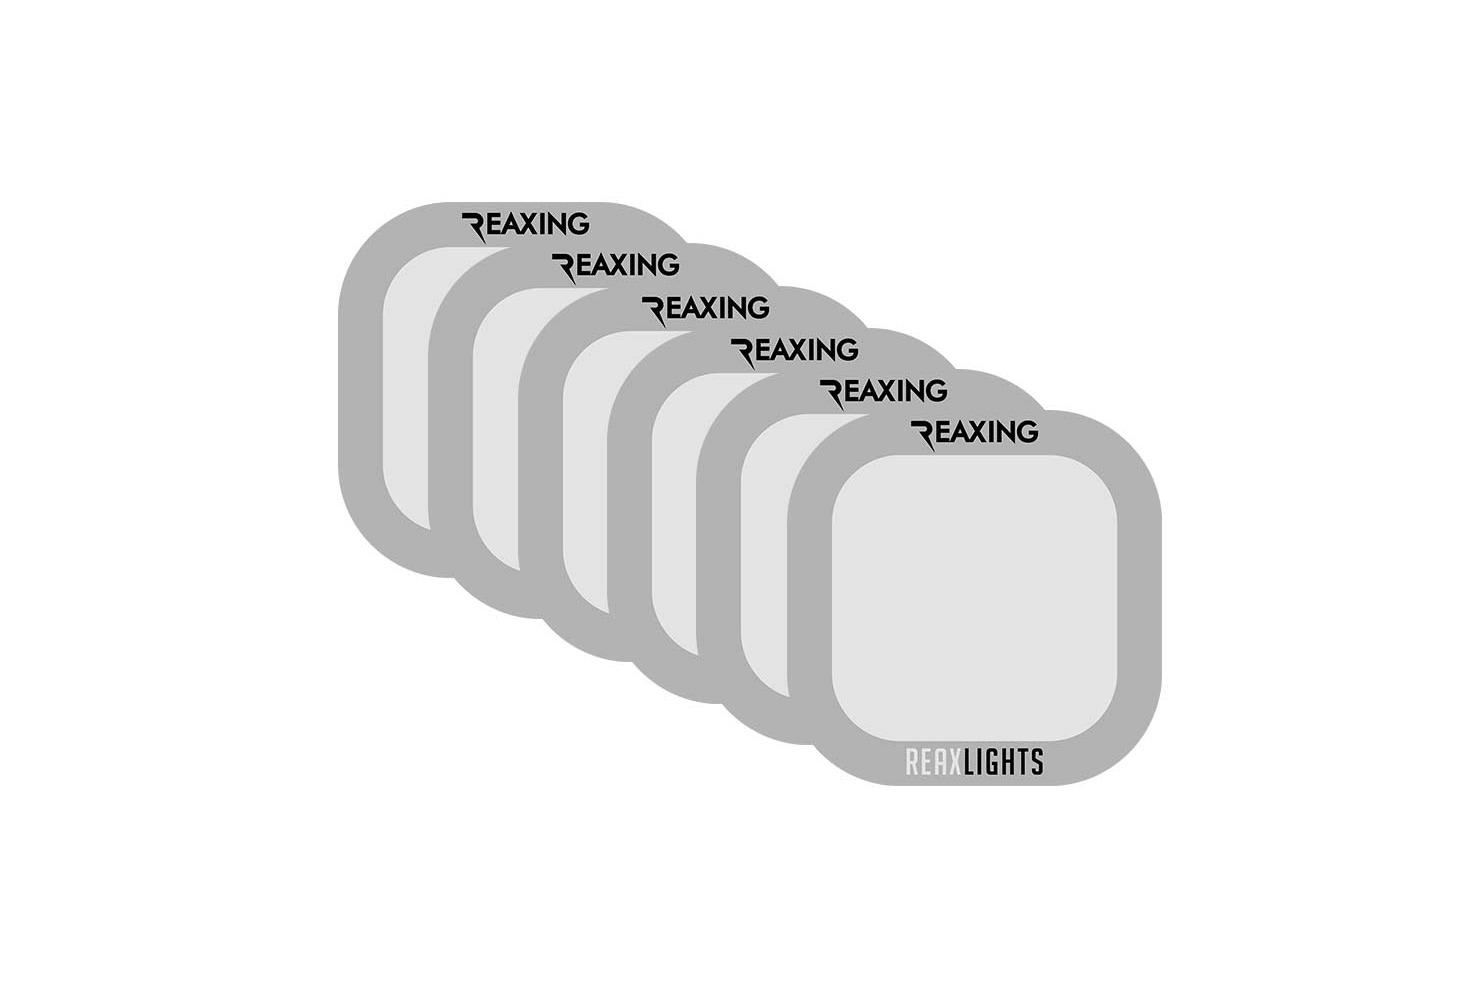 RX1406 Reax Marker Sticker 6 Pack